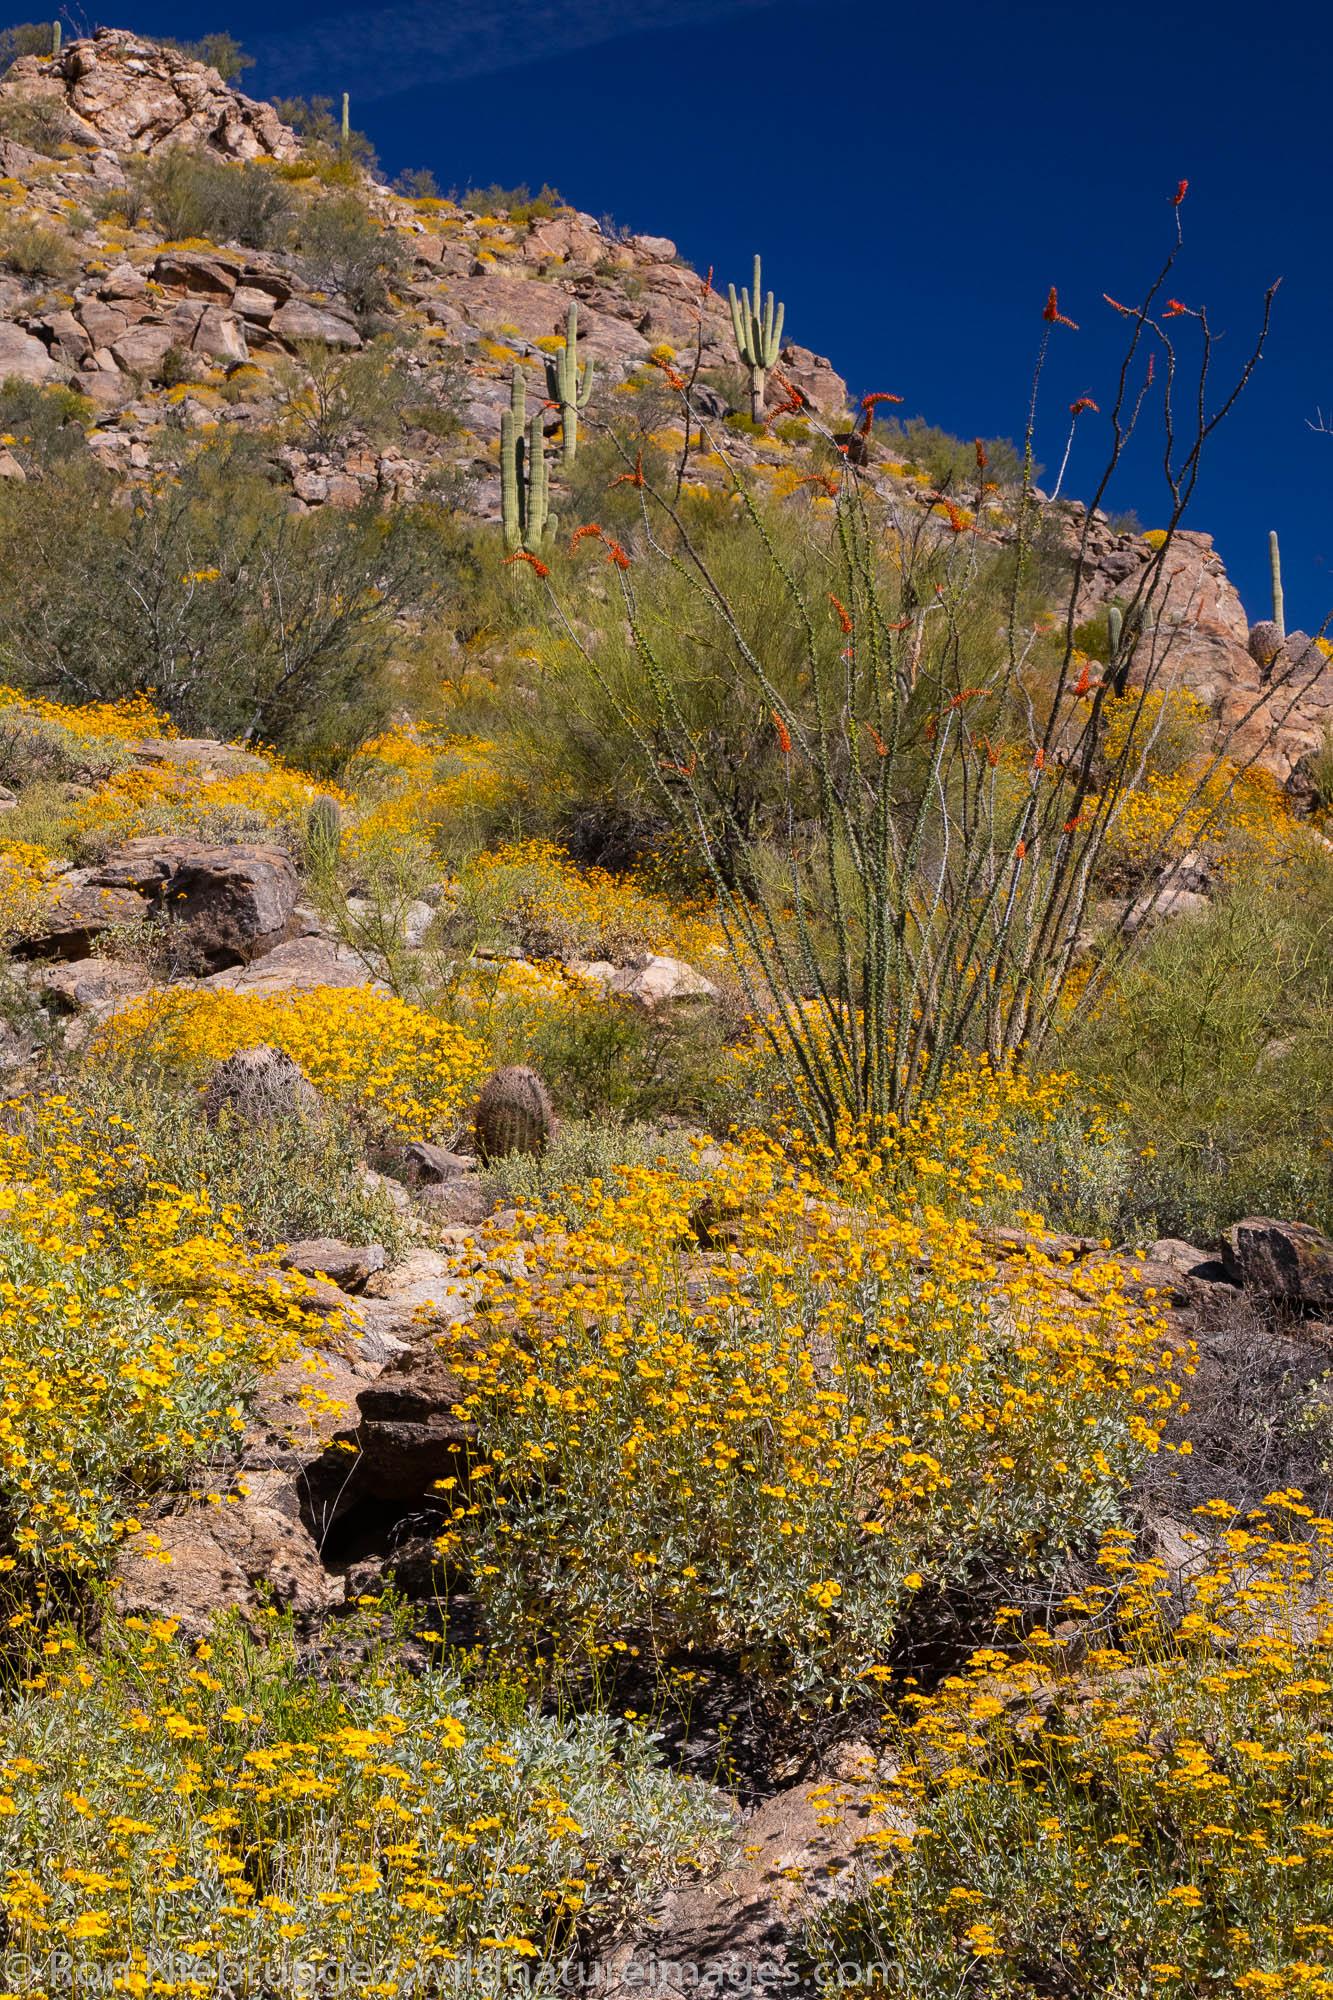 Desert wildflowers in bloom, Arizona.